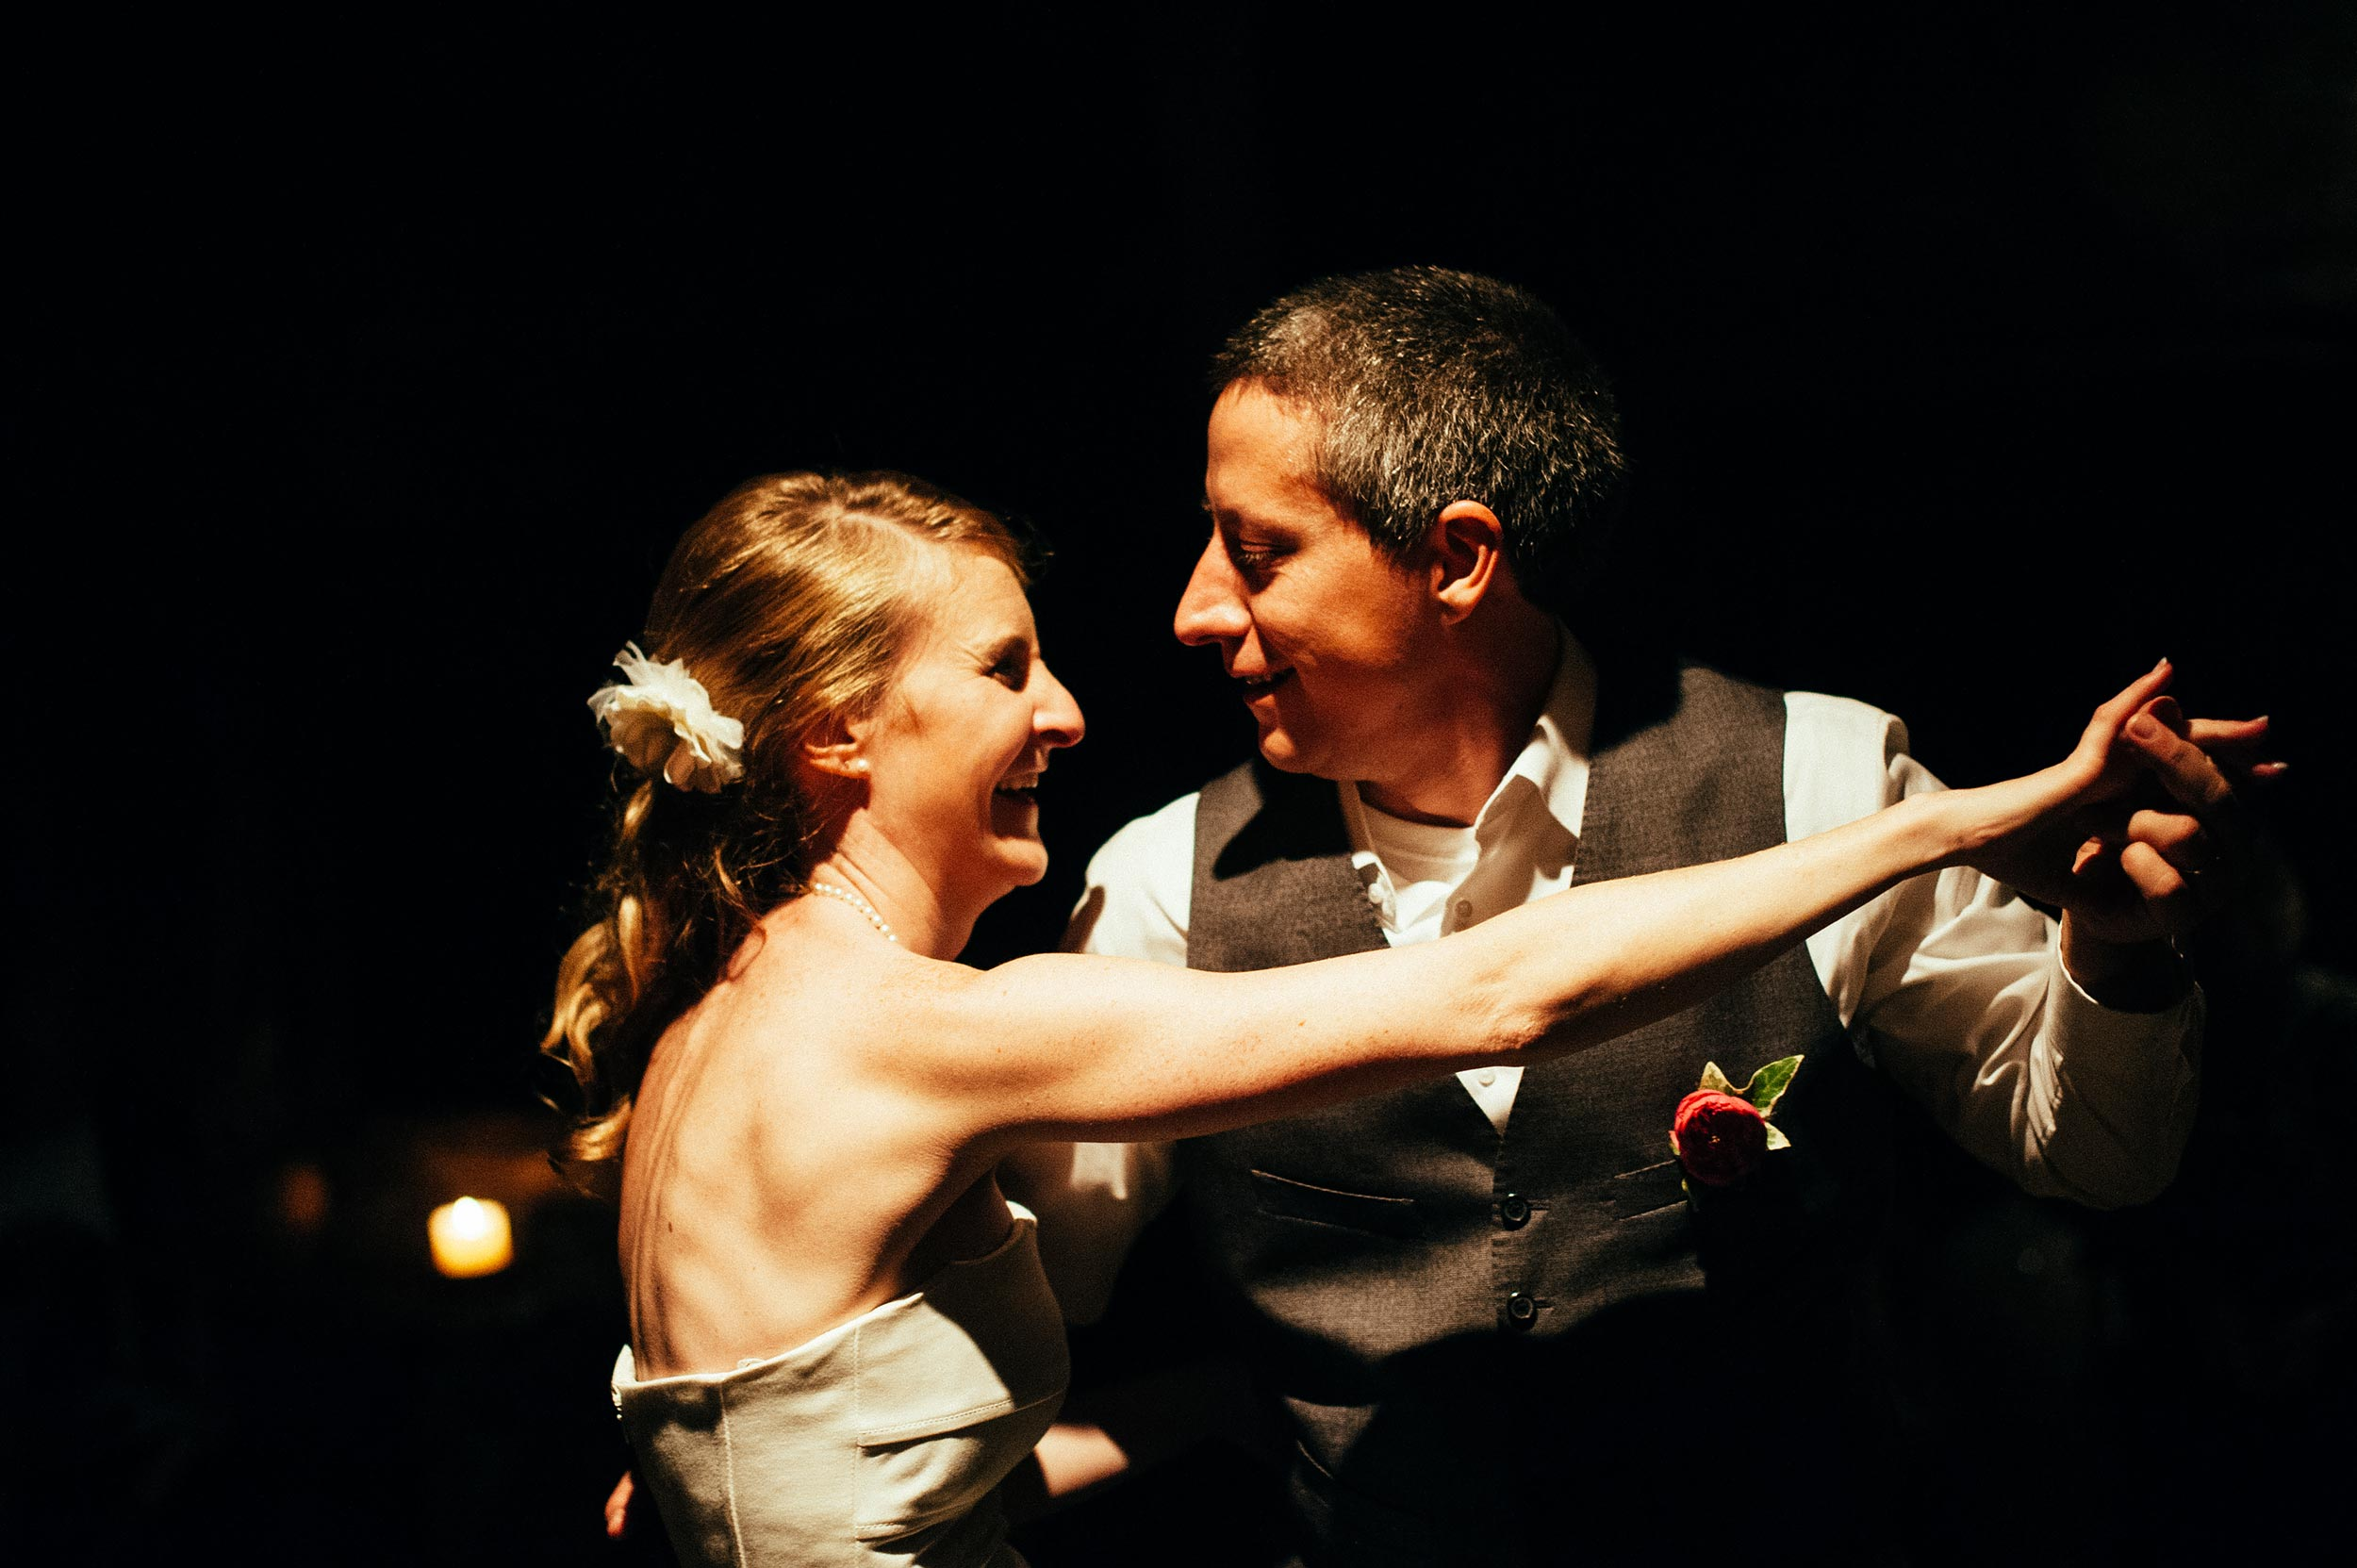 2014-Shelby-Jocelyn-Santo-Stefano-Di-Sessanio-Wedding-Photographer-Italy-Alessandro-Avenali-45.jpg